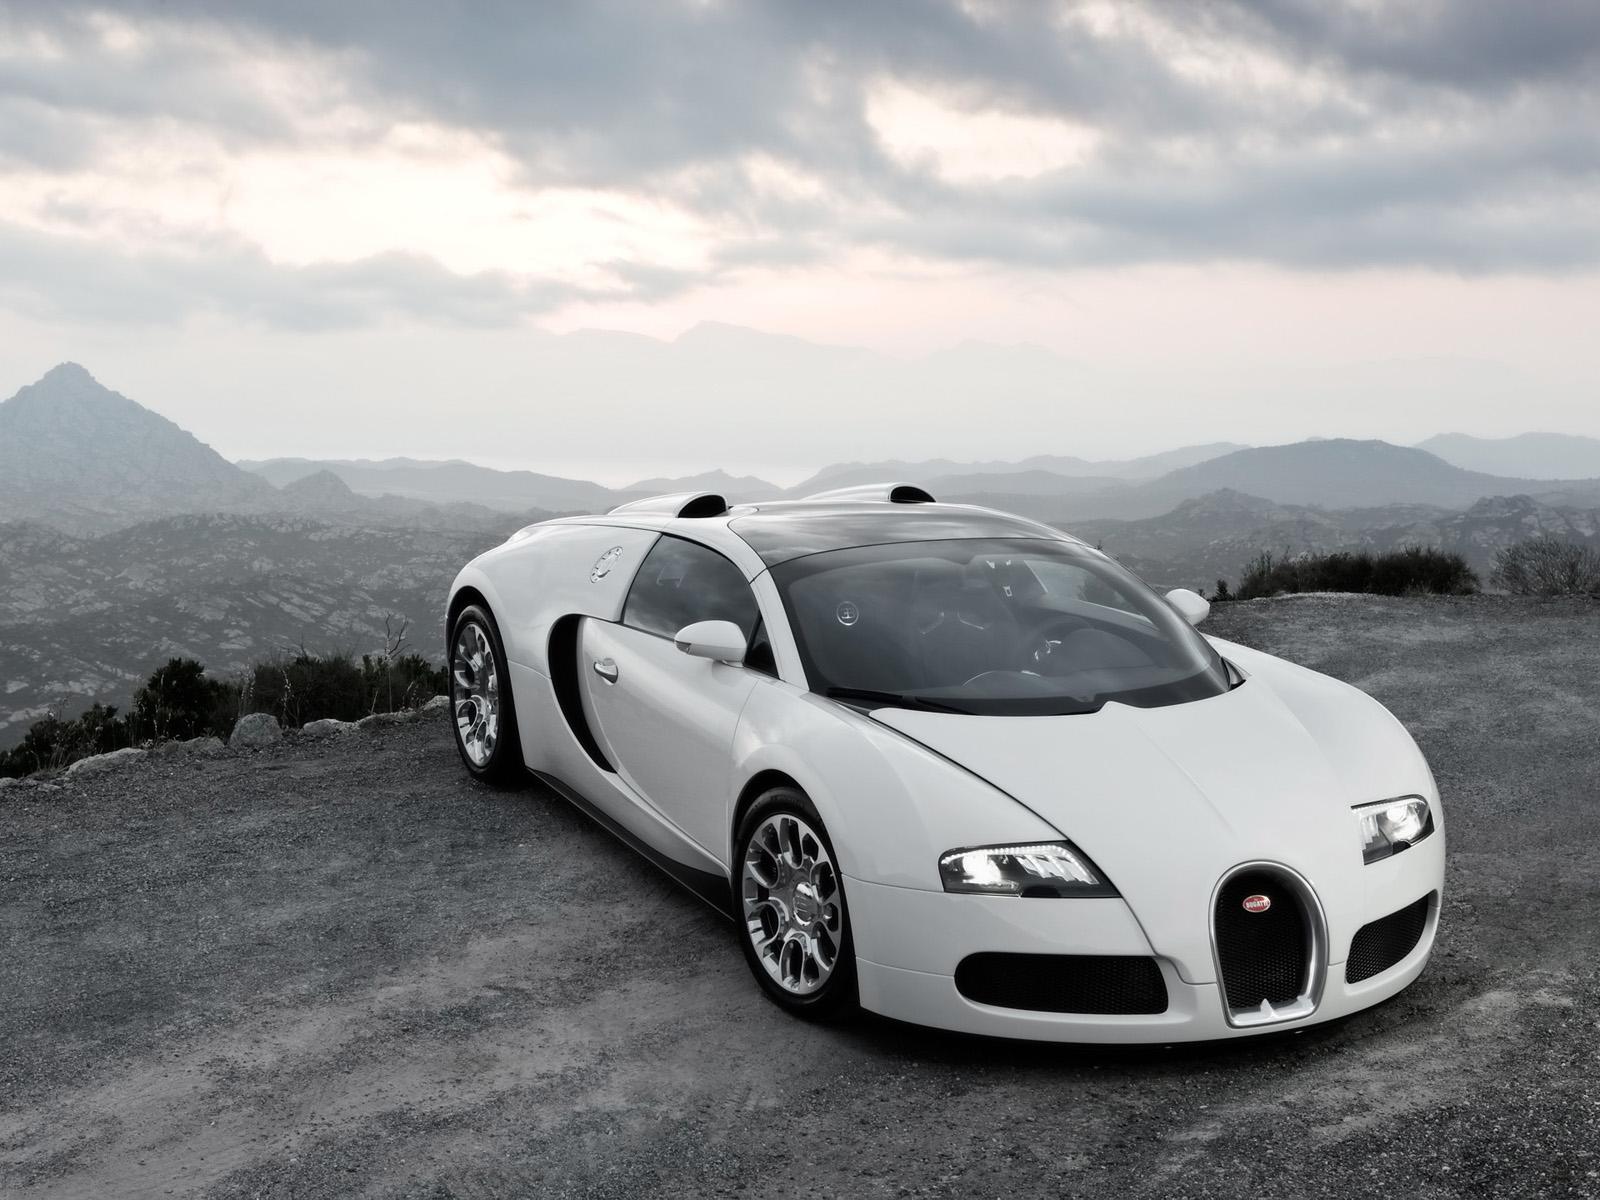 top cool cars bugatti veyron cool car desktop pictures. Black Bedroom Furniture Sets. Home Design Ideas